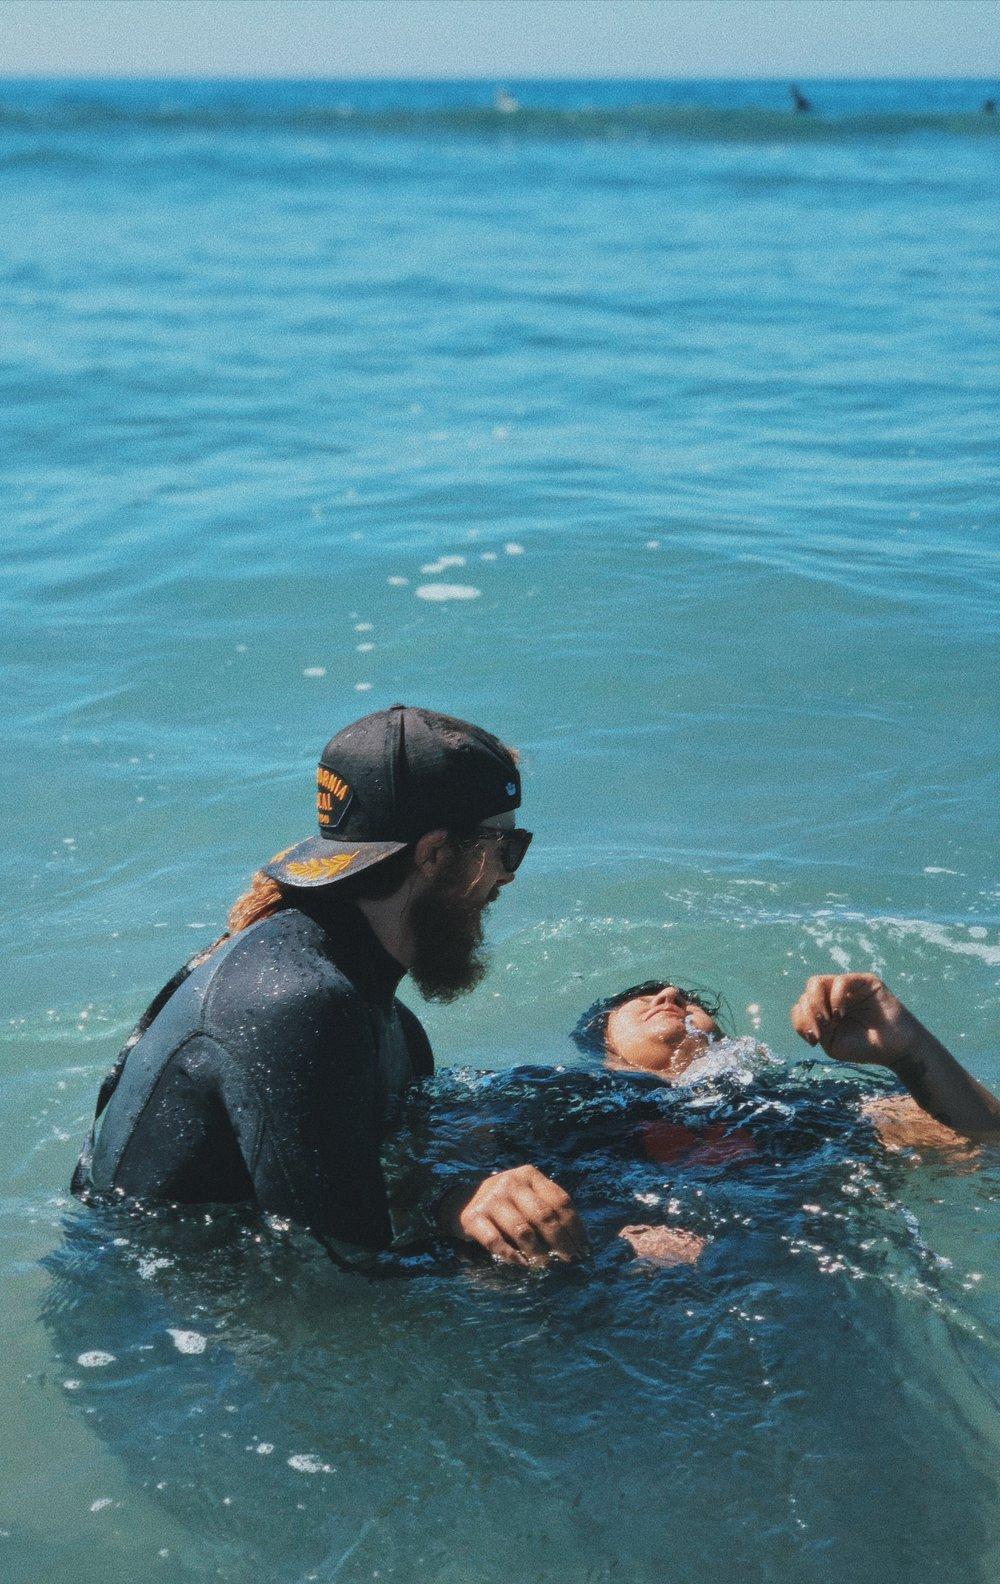 malibu-beach-baptism-mission-hills-christian-church-1.jpg